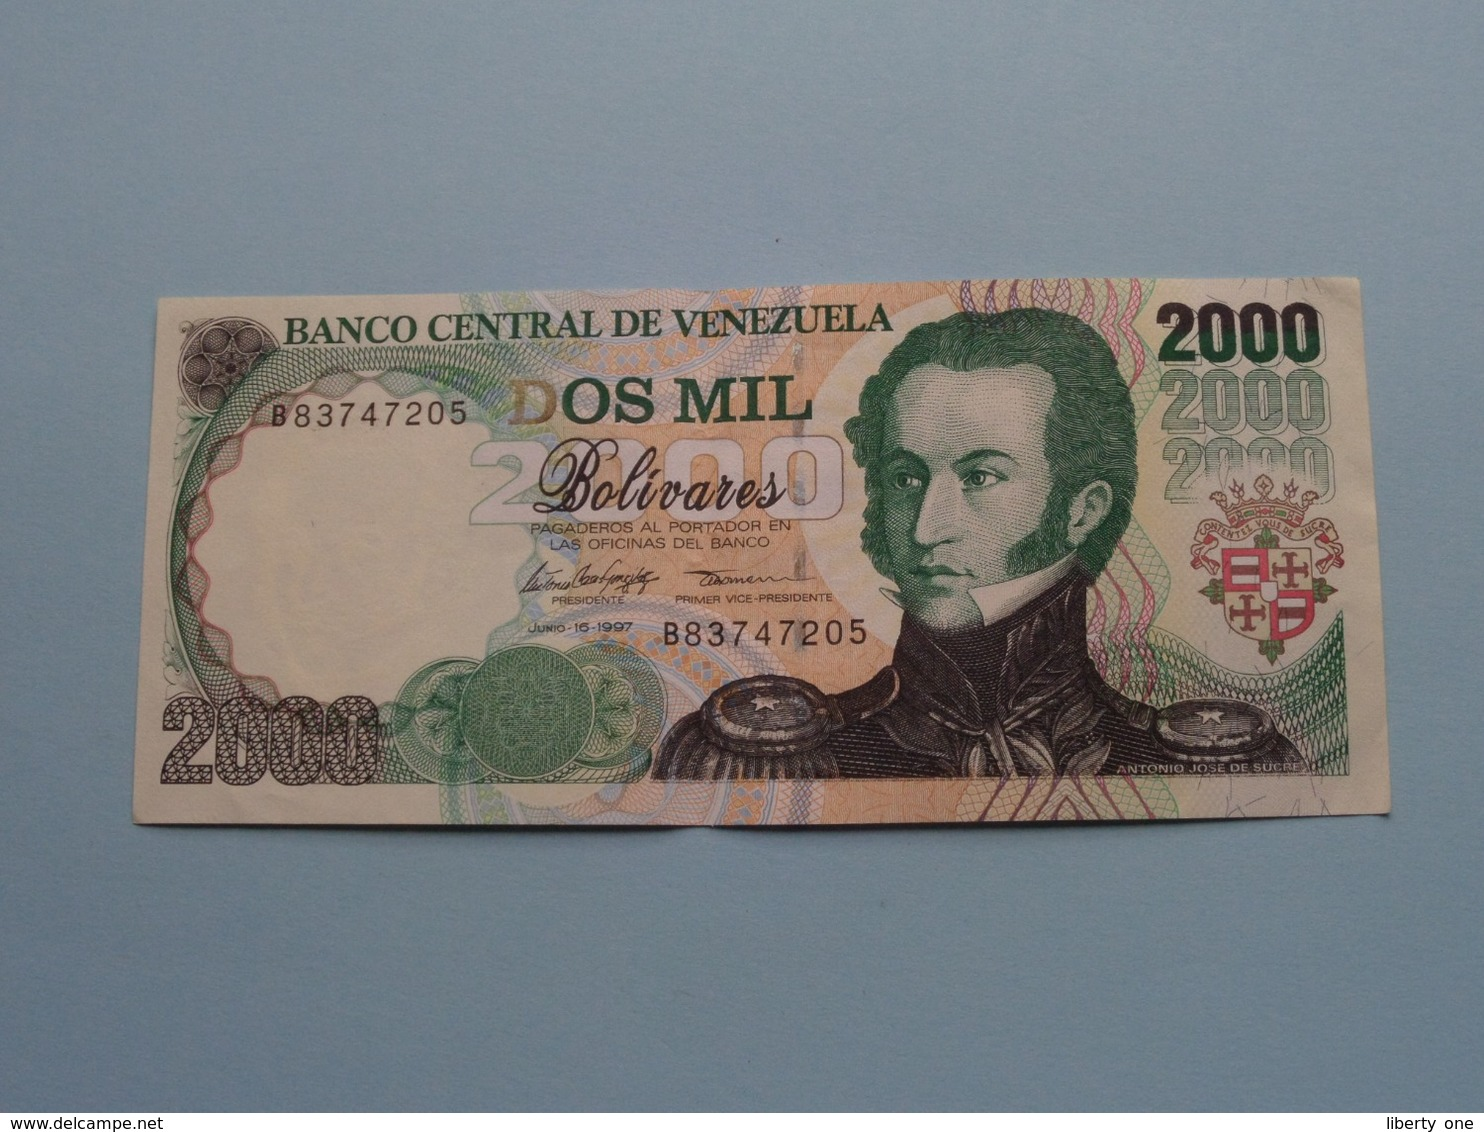 2000 Dos Mil BOLIVARES ( 1997 ) Banco Central De Venezuela ( For Grade, Please See Photo ) ! - Venezuela